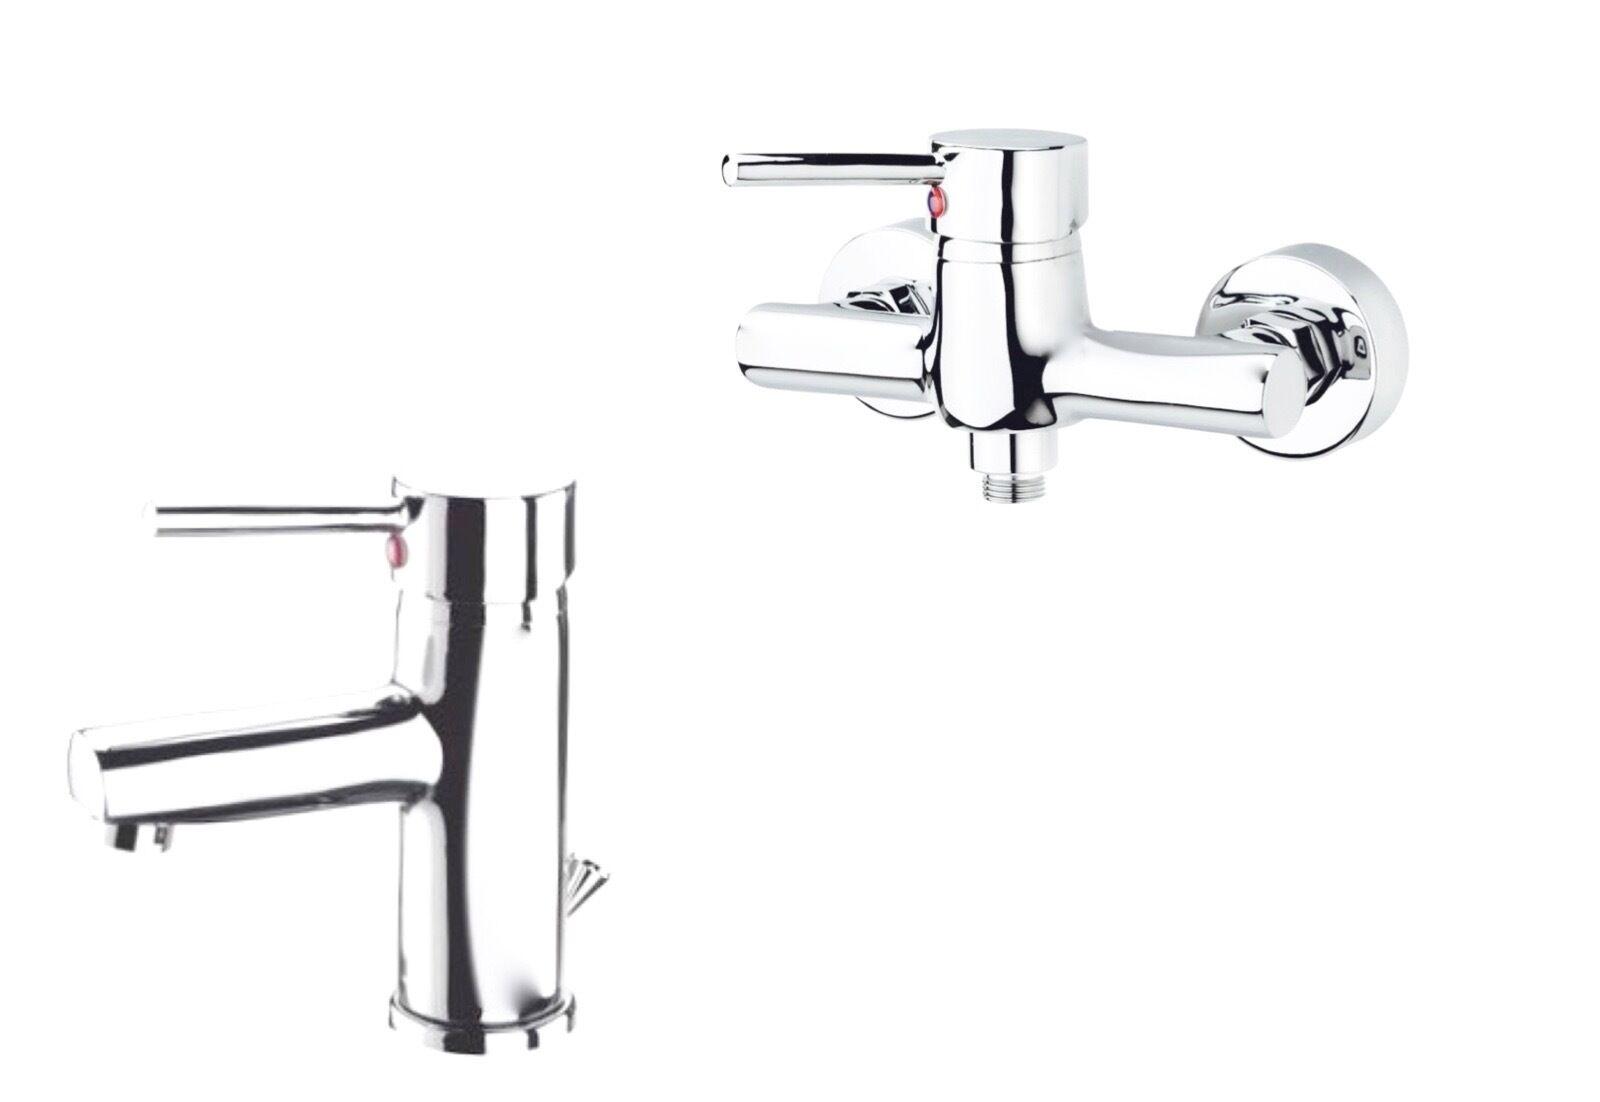 Bad & Küche Niedrigerer Preis Mit 3s Paffoni City Zsal145crag Neu Duschstange Aus Metall Verchromt Wand Dusch Bad Armaturen